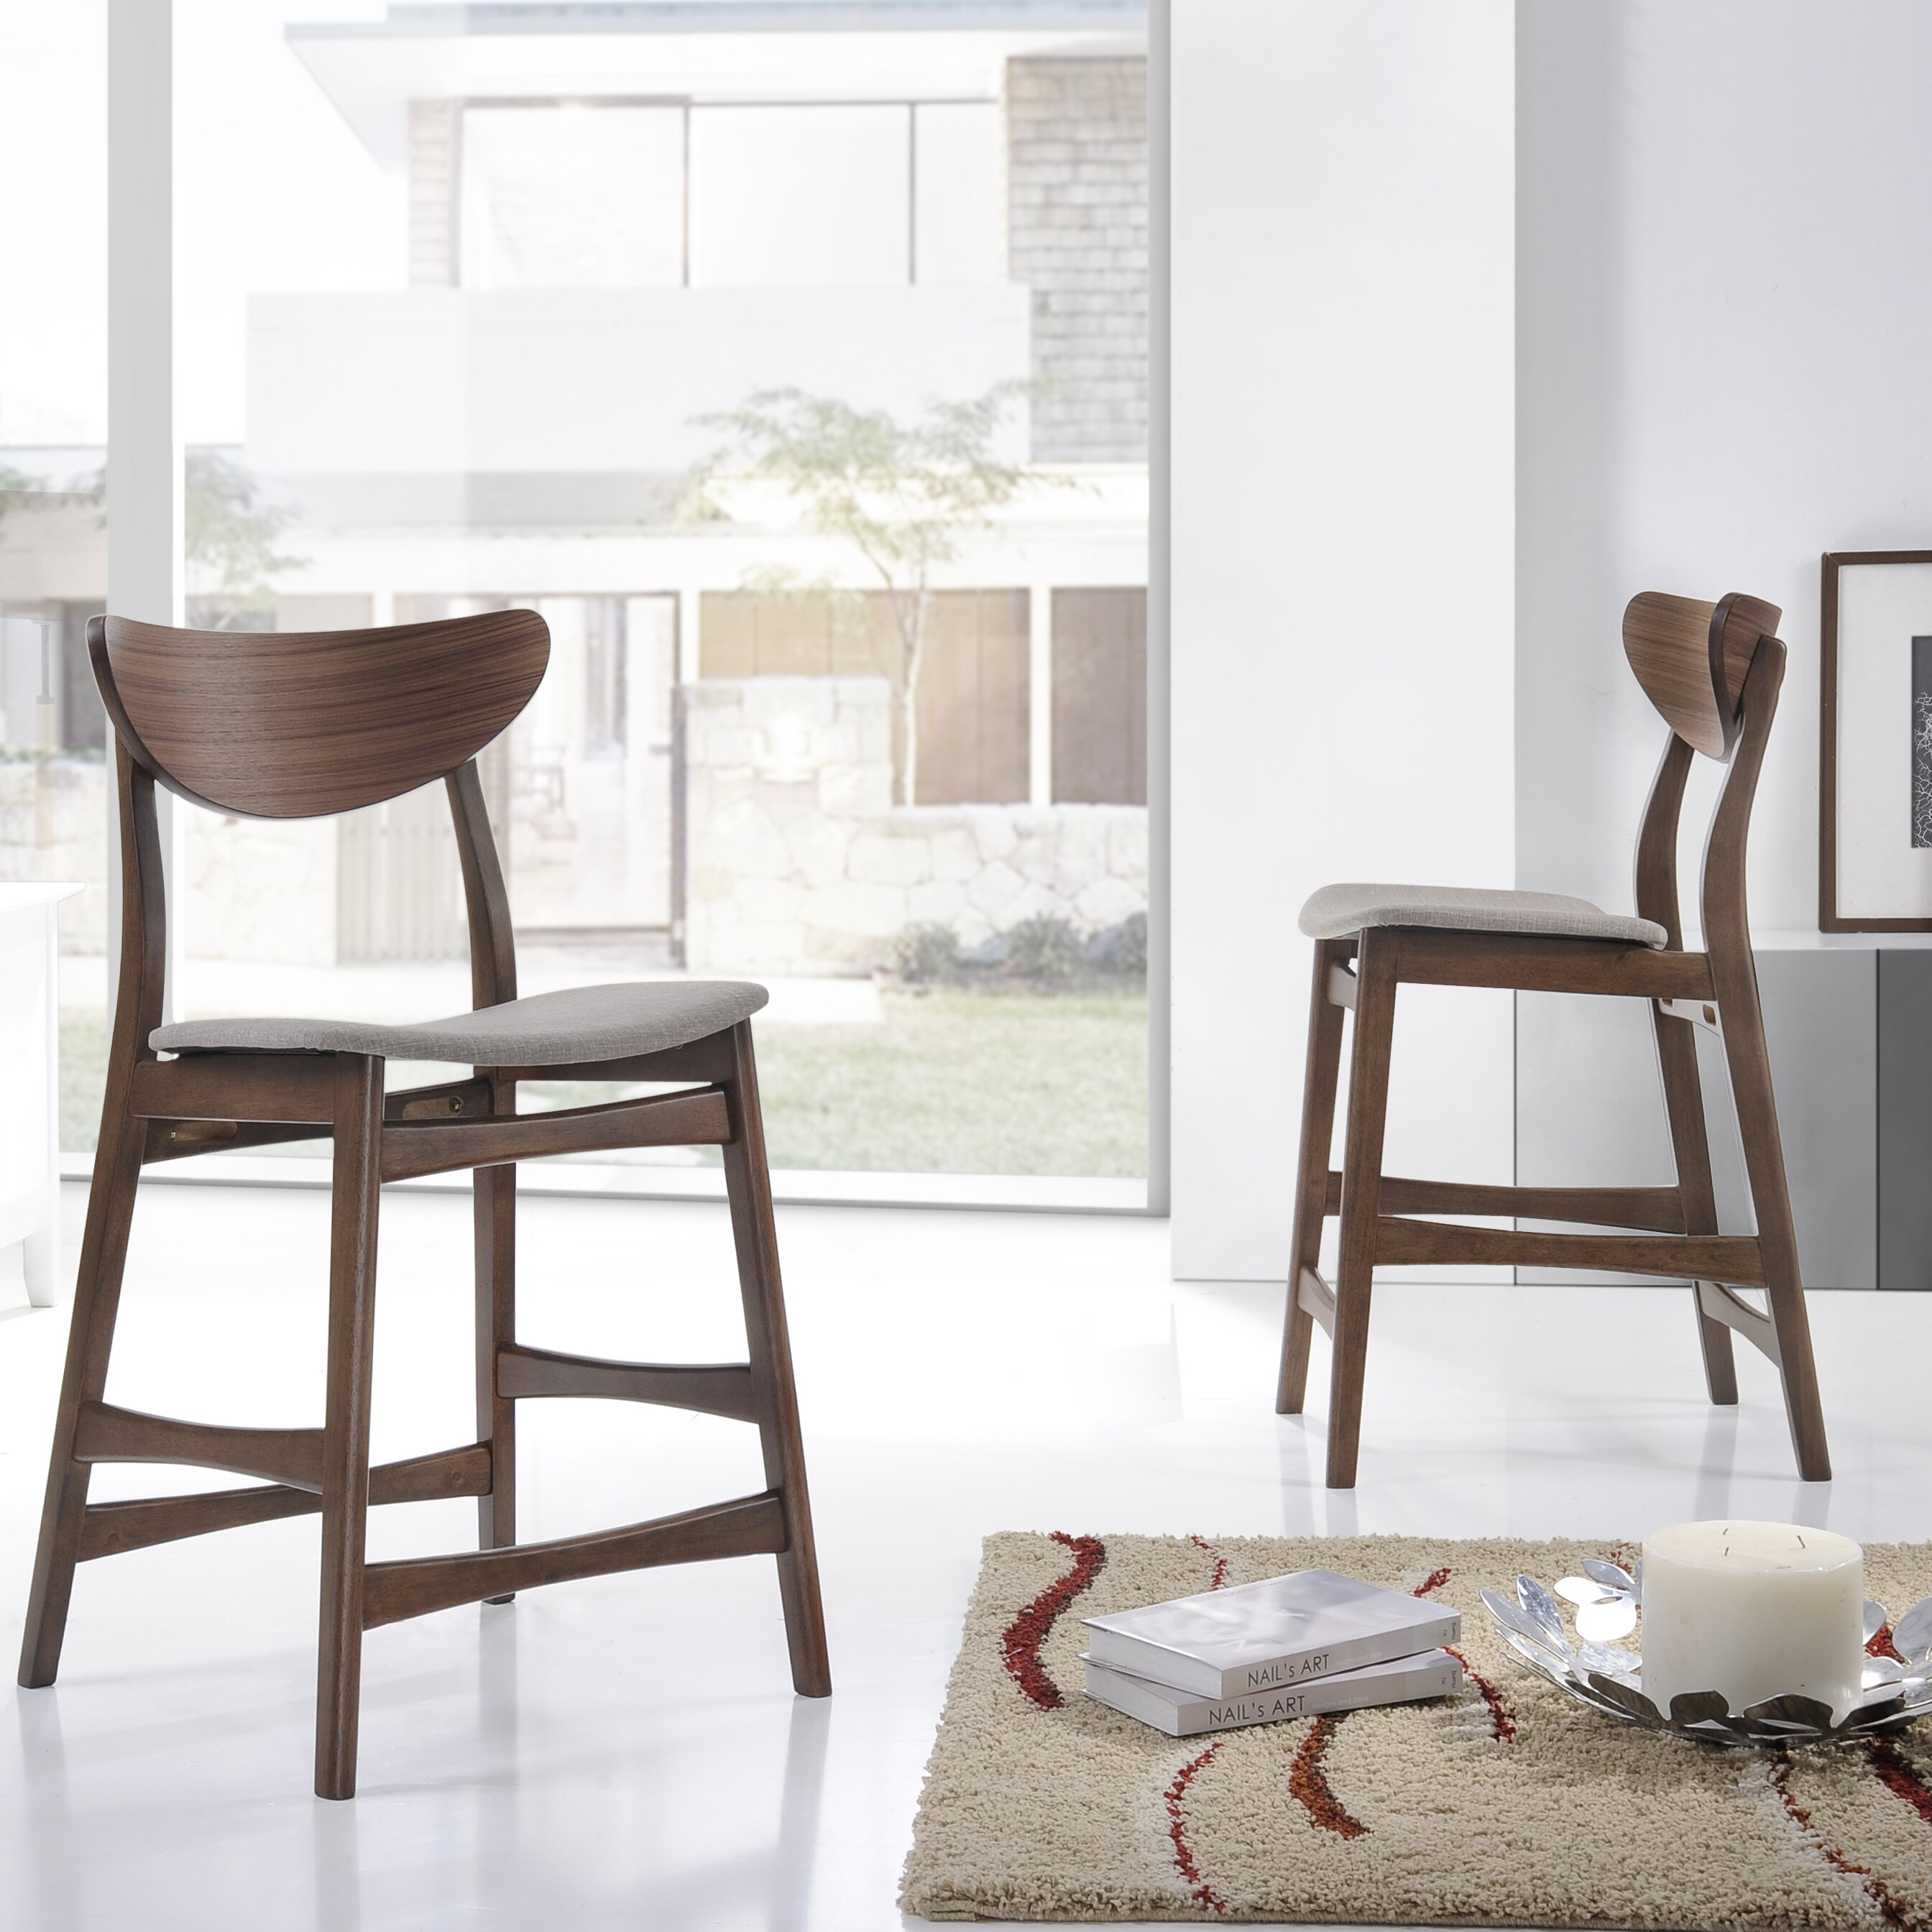 "Bar Furniture By Baxton Studios: Wholesale Interiors Baxton Studio 23.5"" Bar Stool"